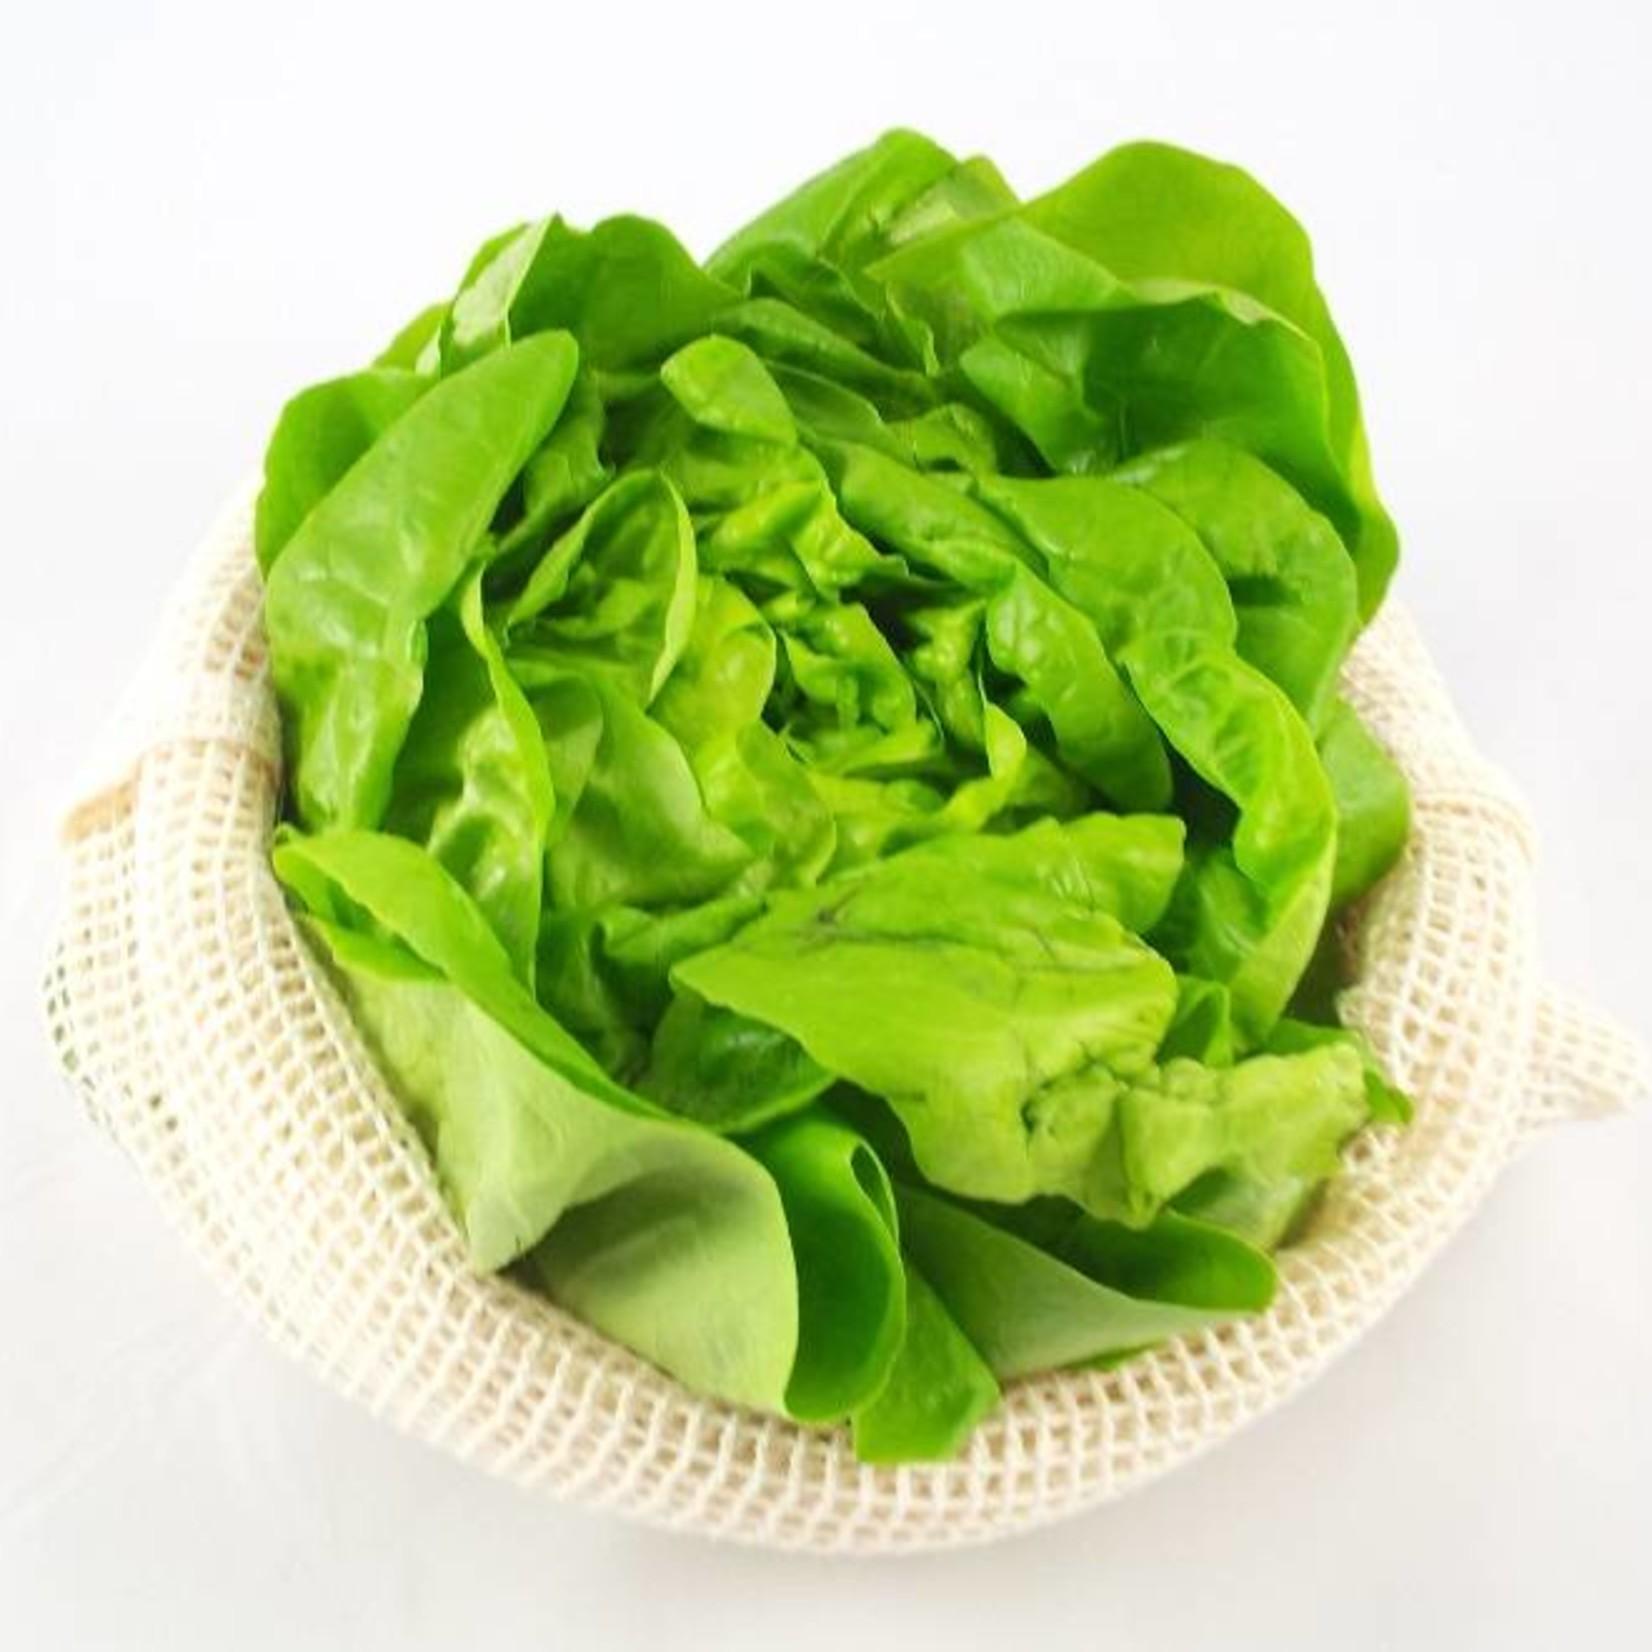 Re-Sacks Katoenen groente- en fruitnetjes